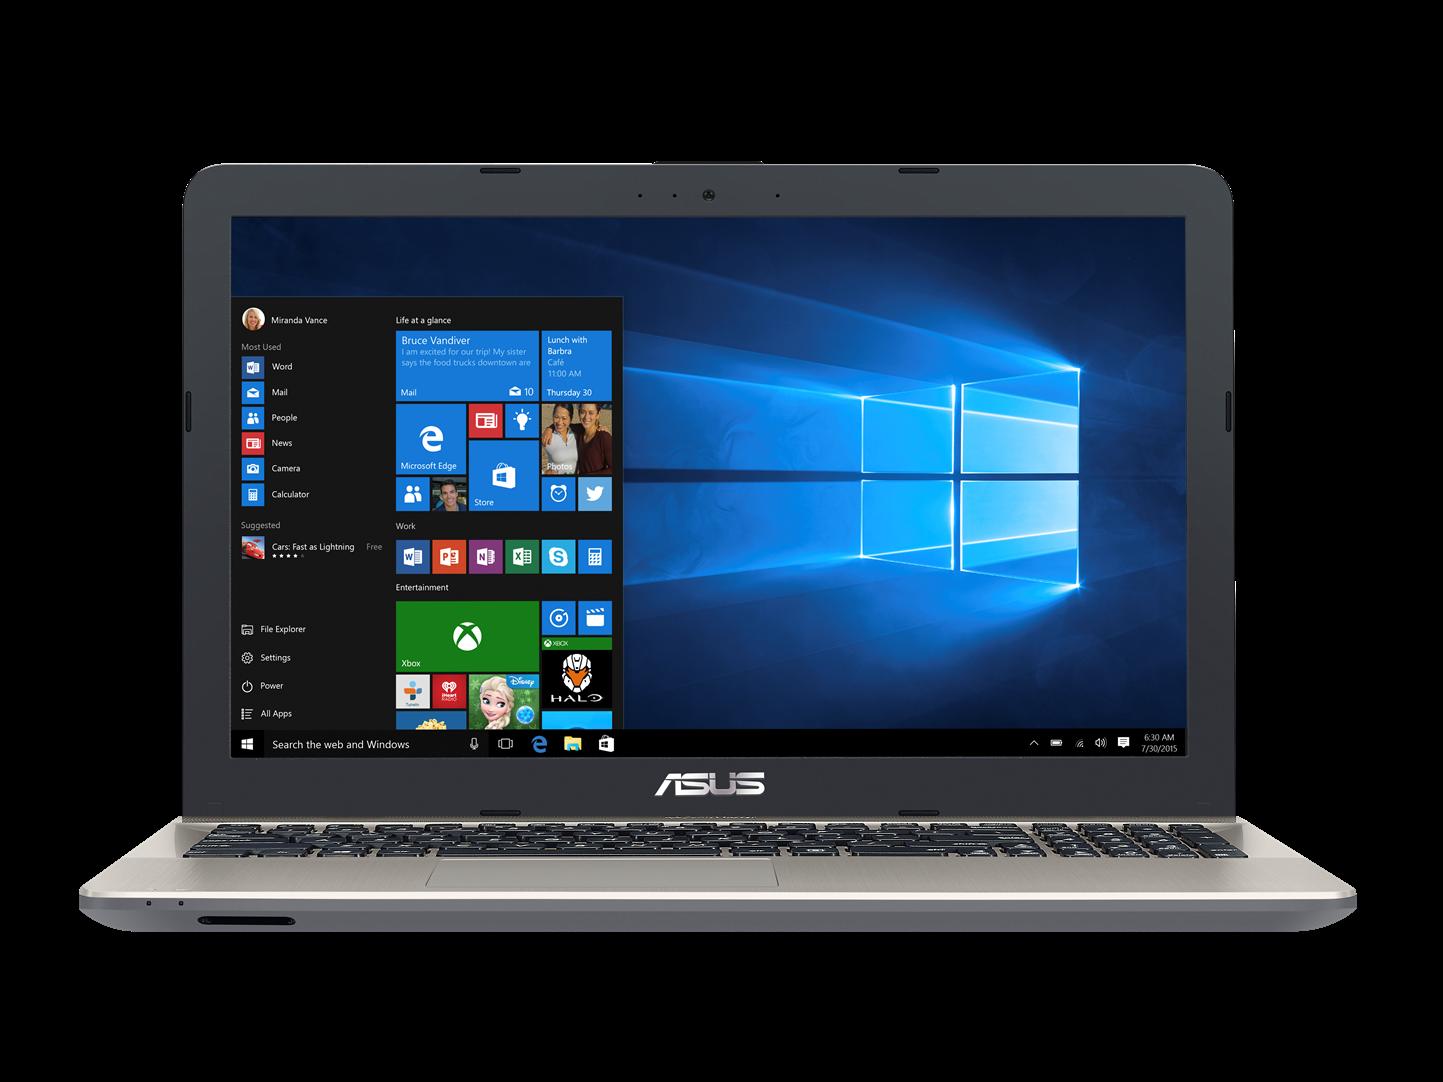 ASUS NB X451UA i5-7200U/4GB/1TB 5.4/15.6 FHD AG/DVD/W10 CHocolate Black